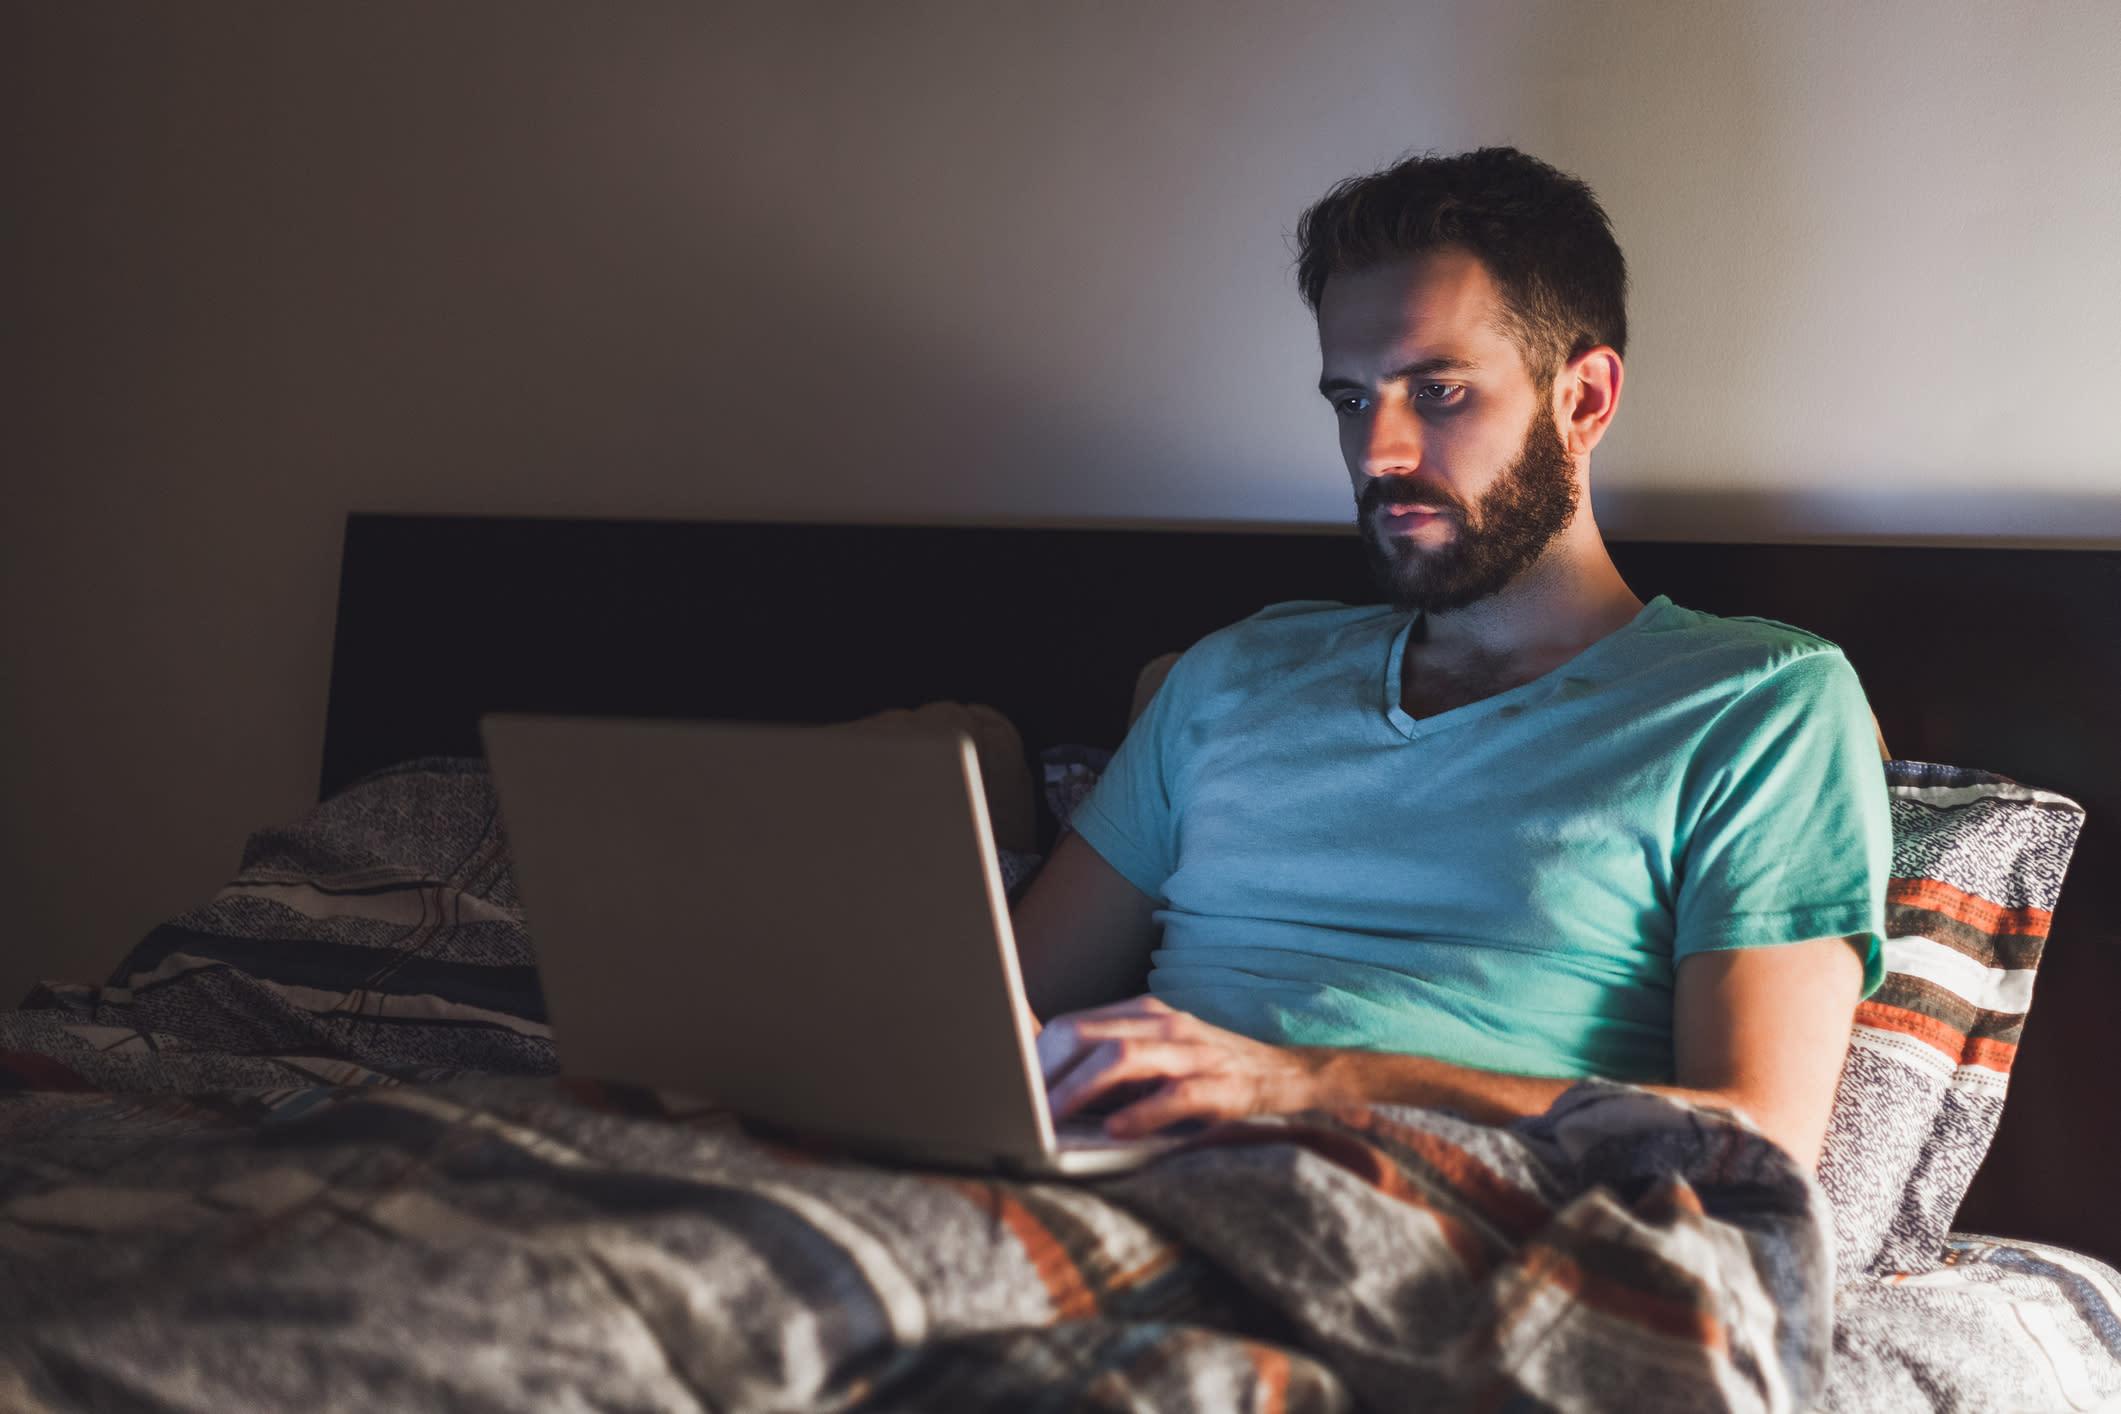 п»їMost Legitimate Mature Online Dating Sites Site No Membership